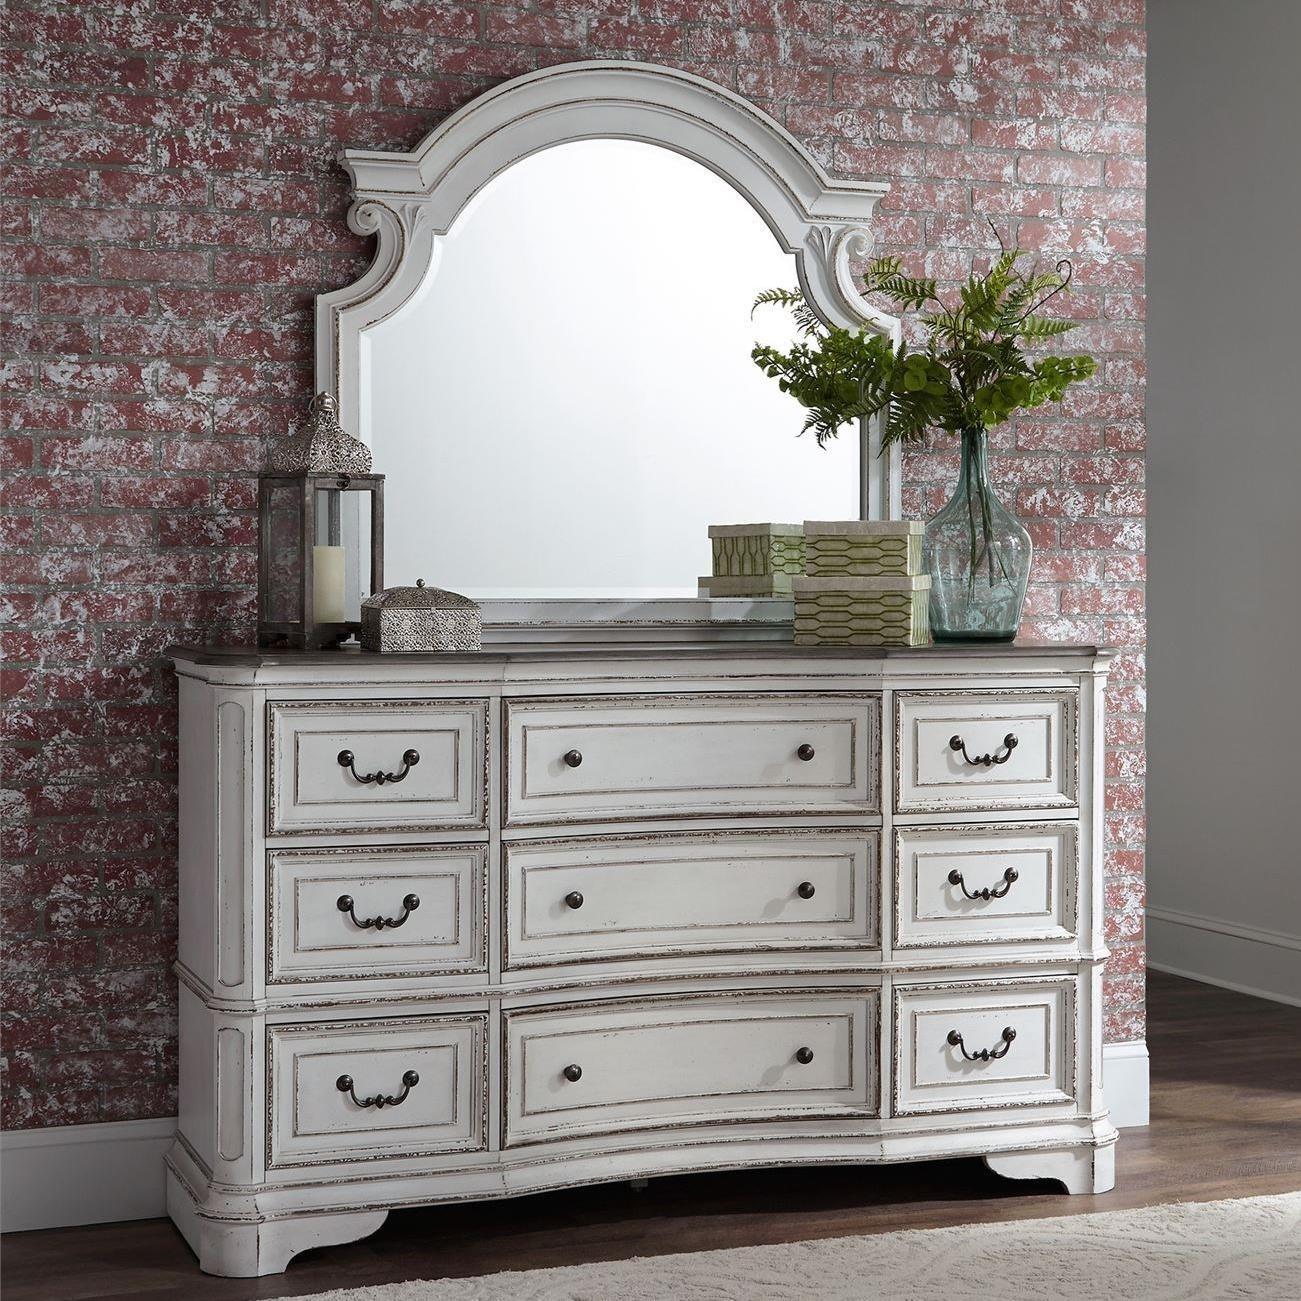 Magnolia Manor 9 Drawer Dresser and Mirror by Liberty Furniture at Bullard Furniture